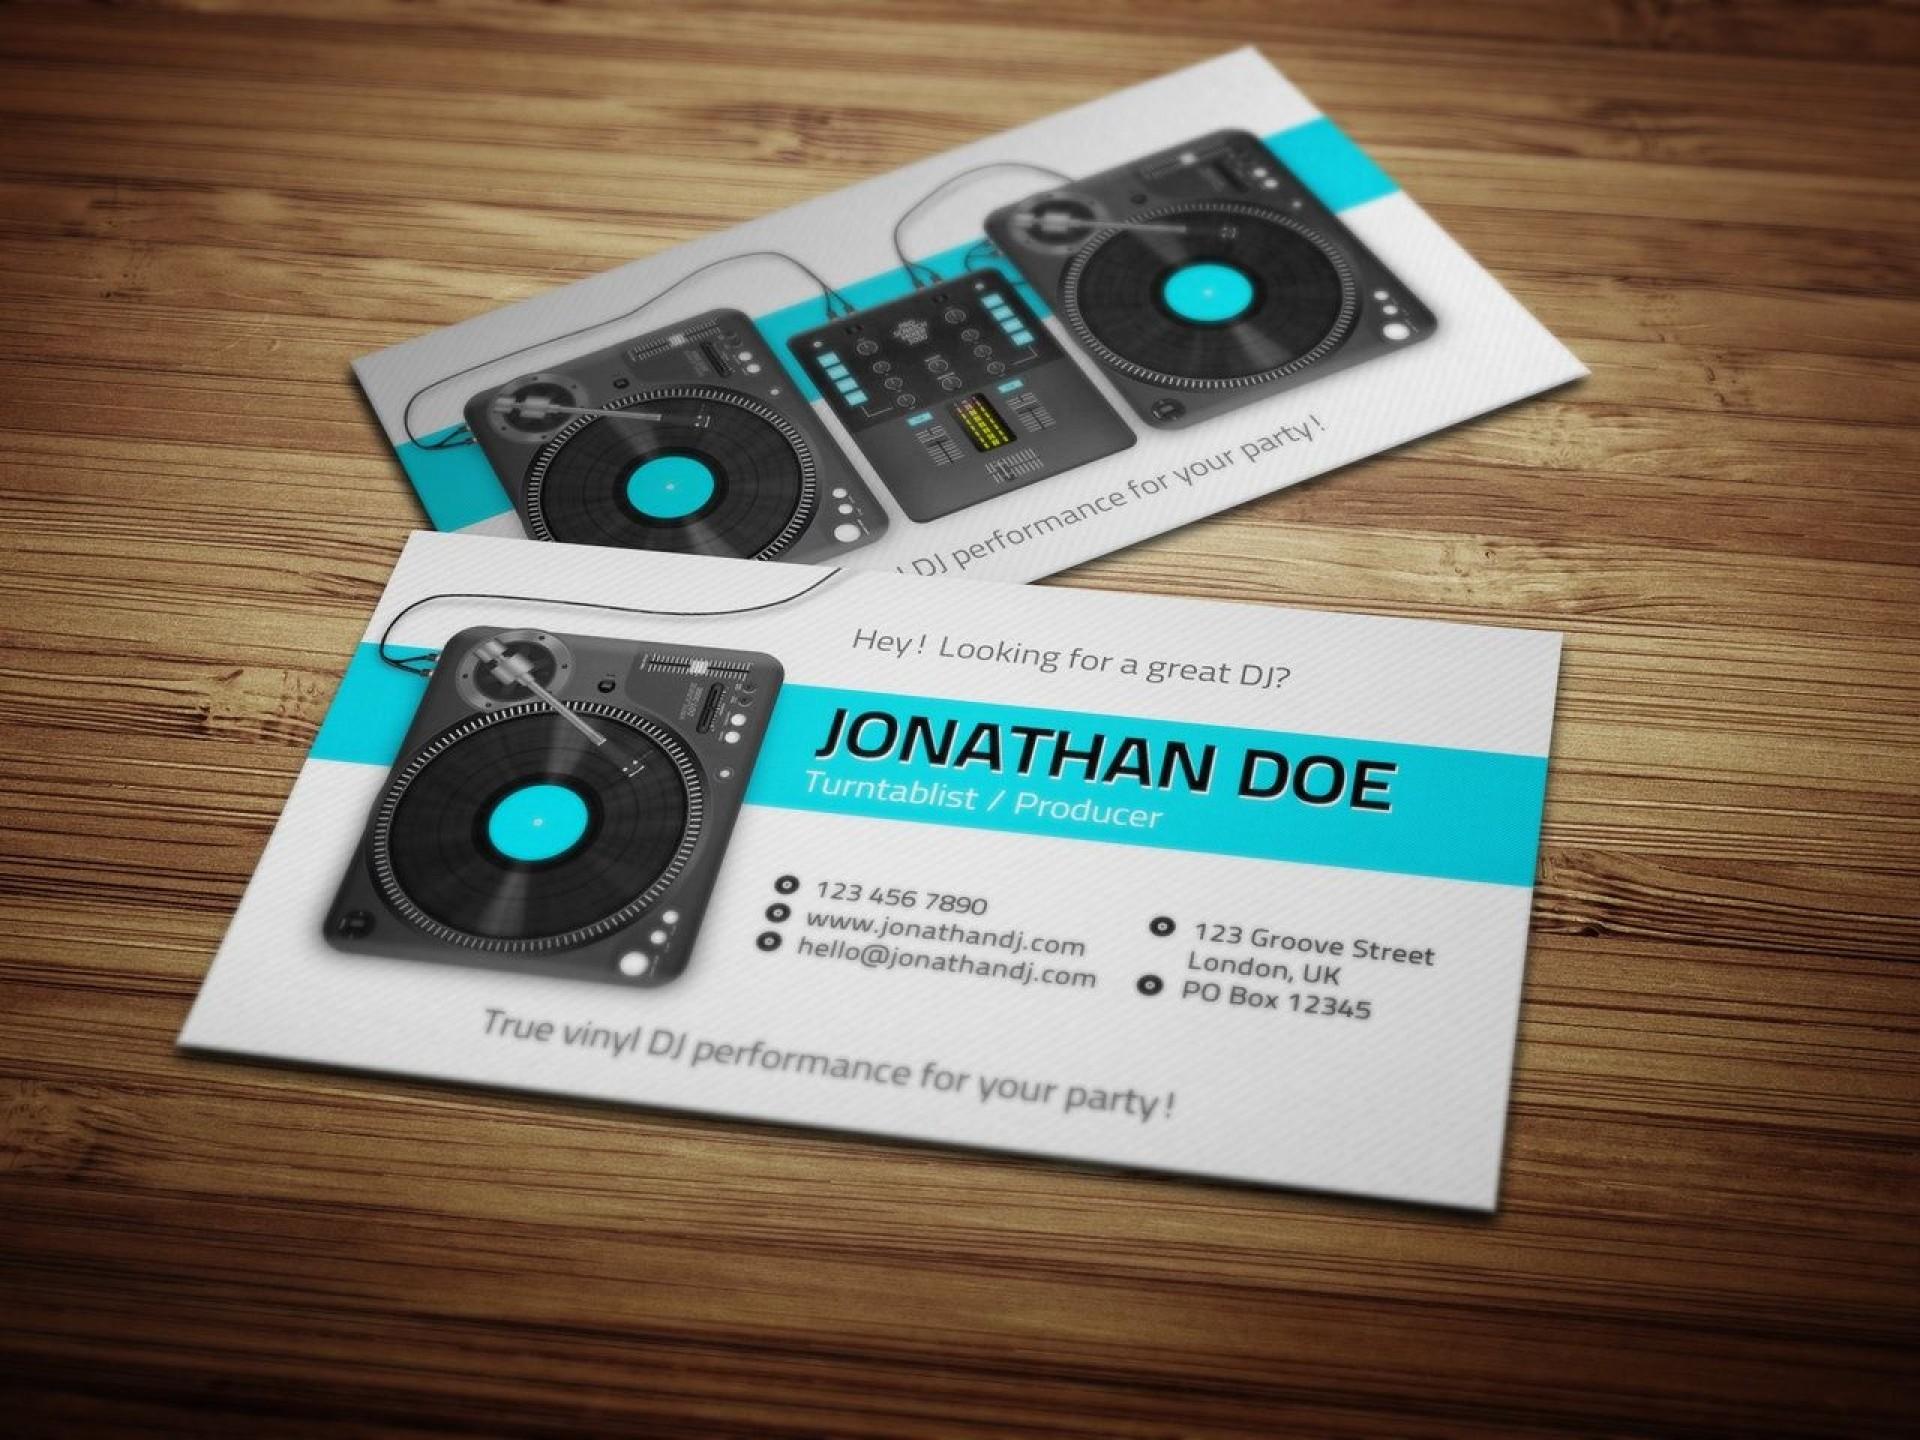 005 Unusual Dj Busines Card Template Design  Psd Free Download1920